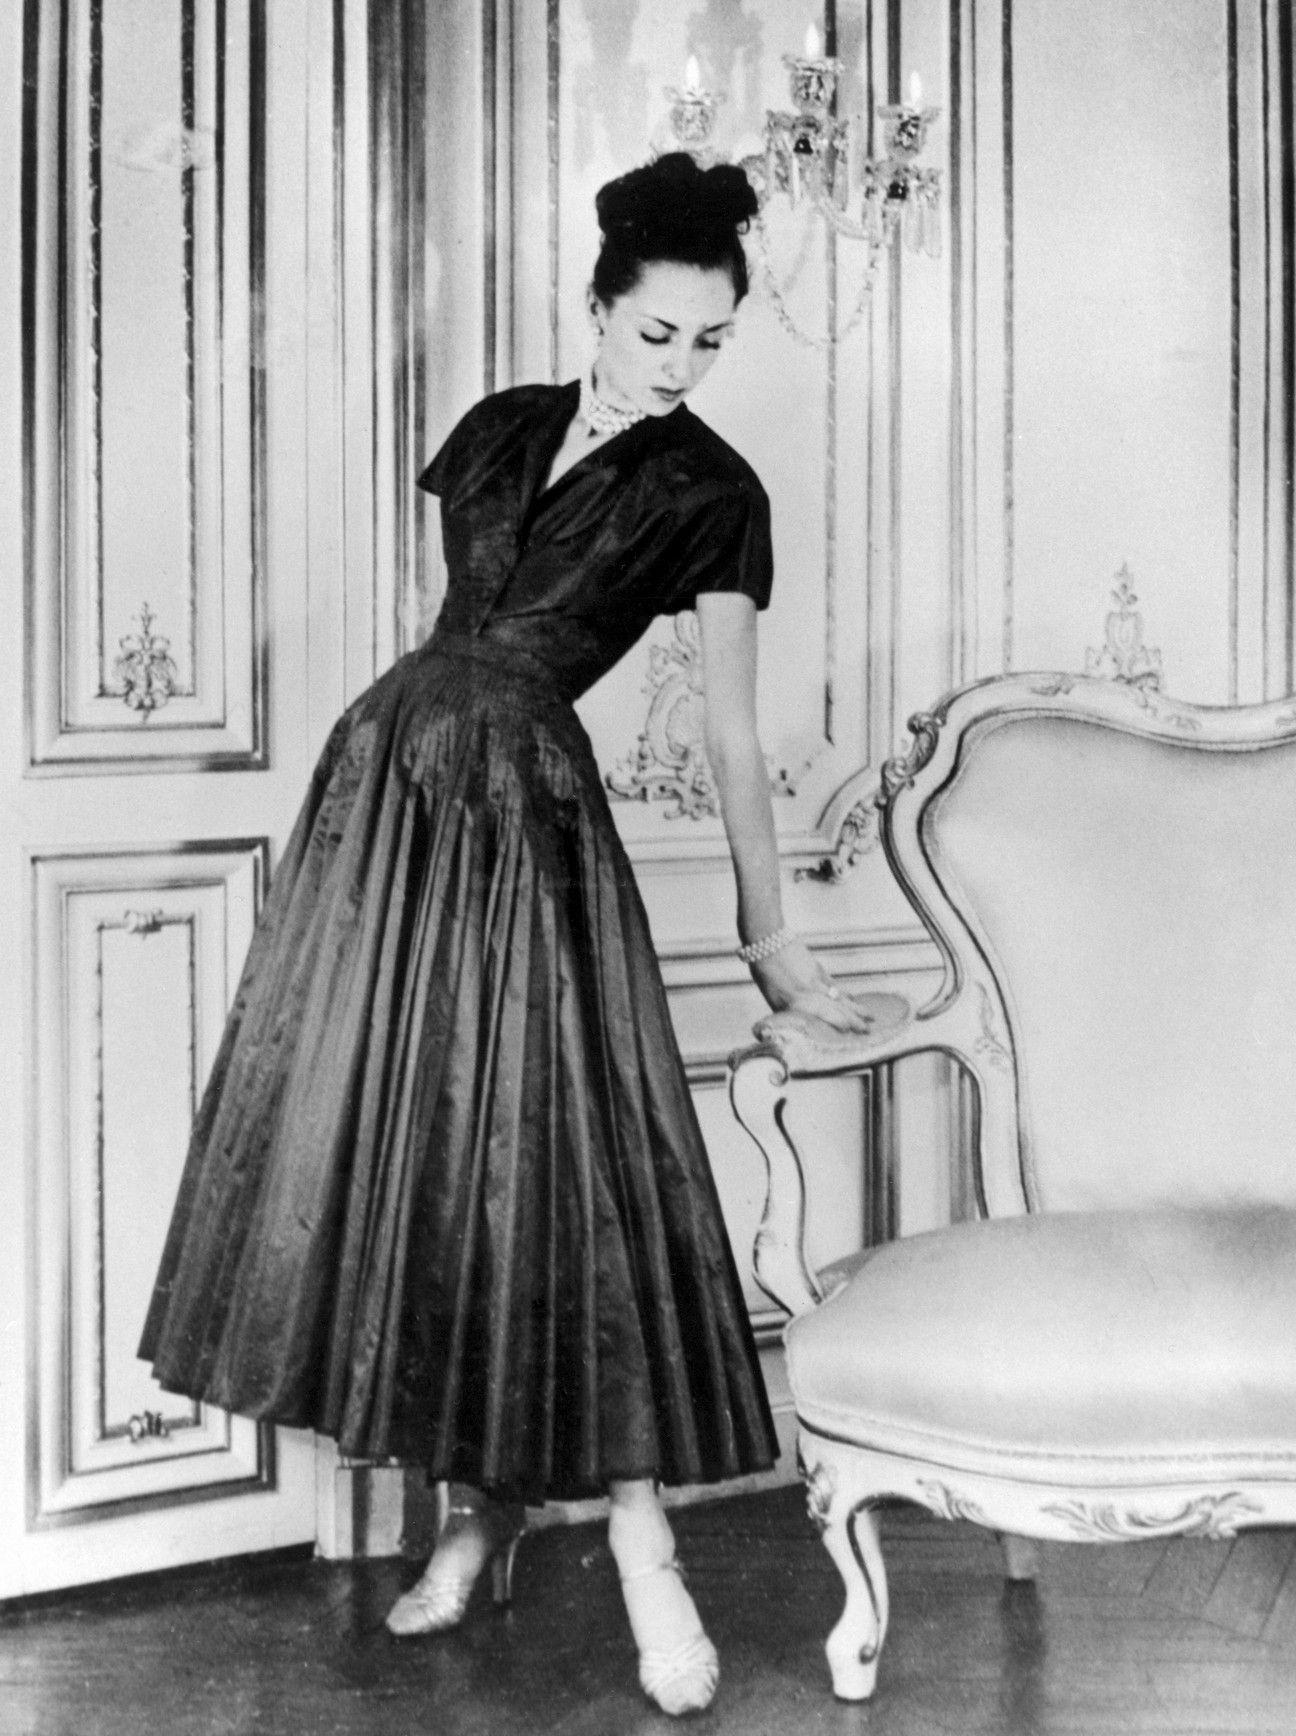 Iconic 40s Fashion: A Christian Dior Creation (1947)